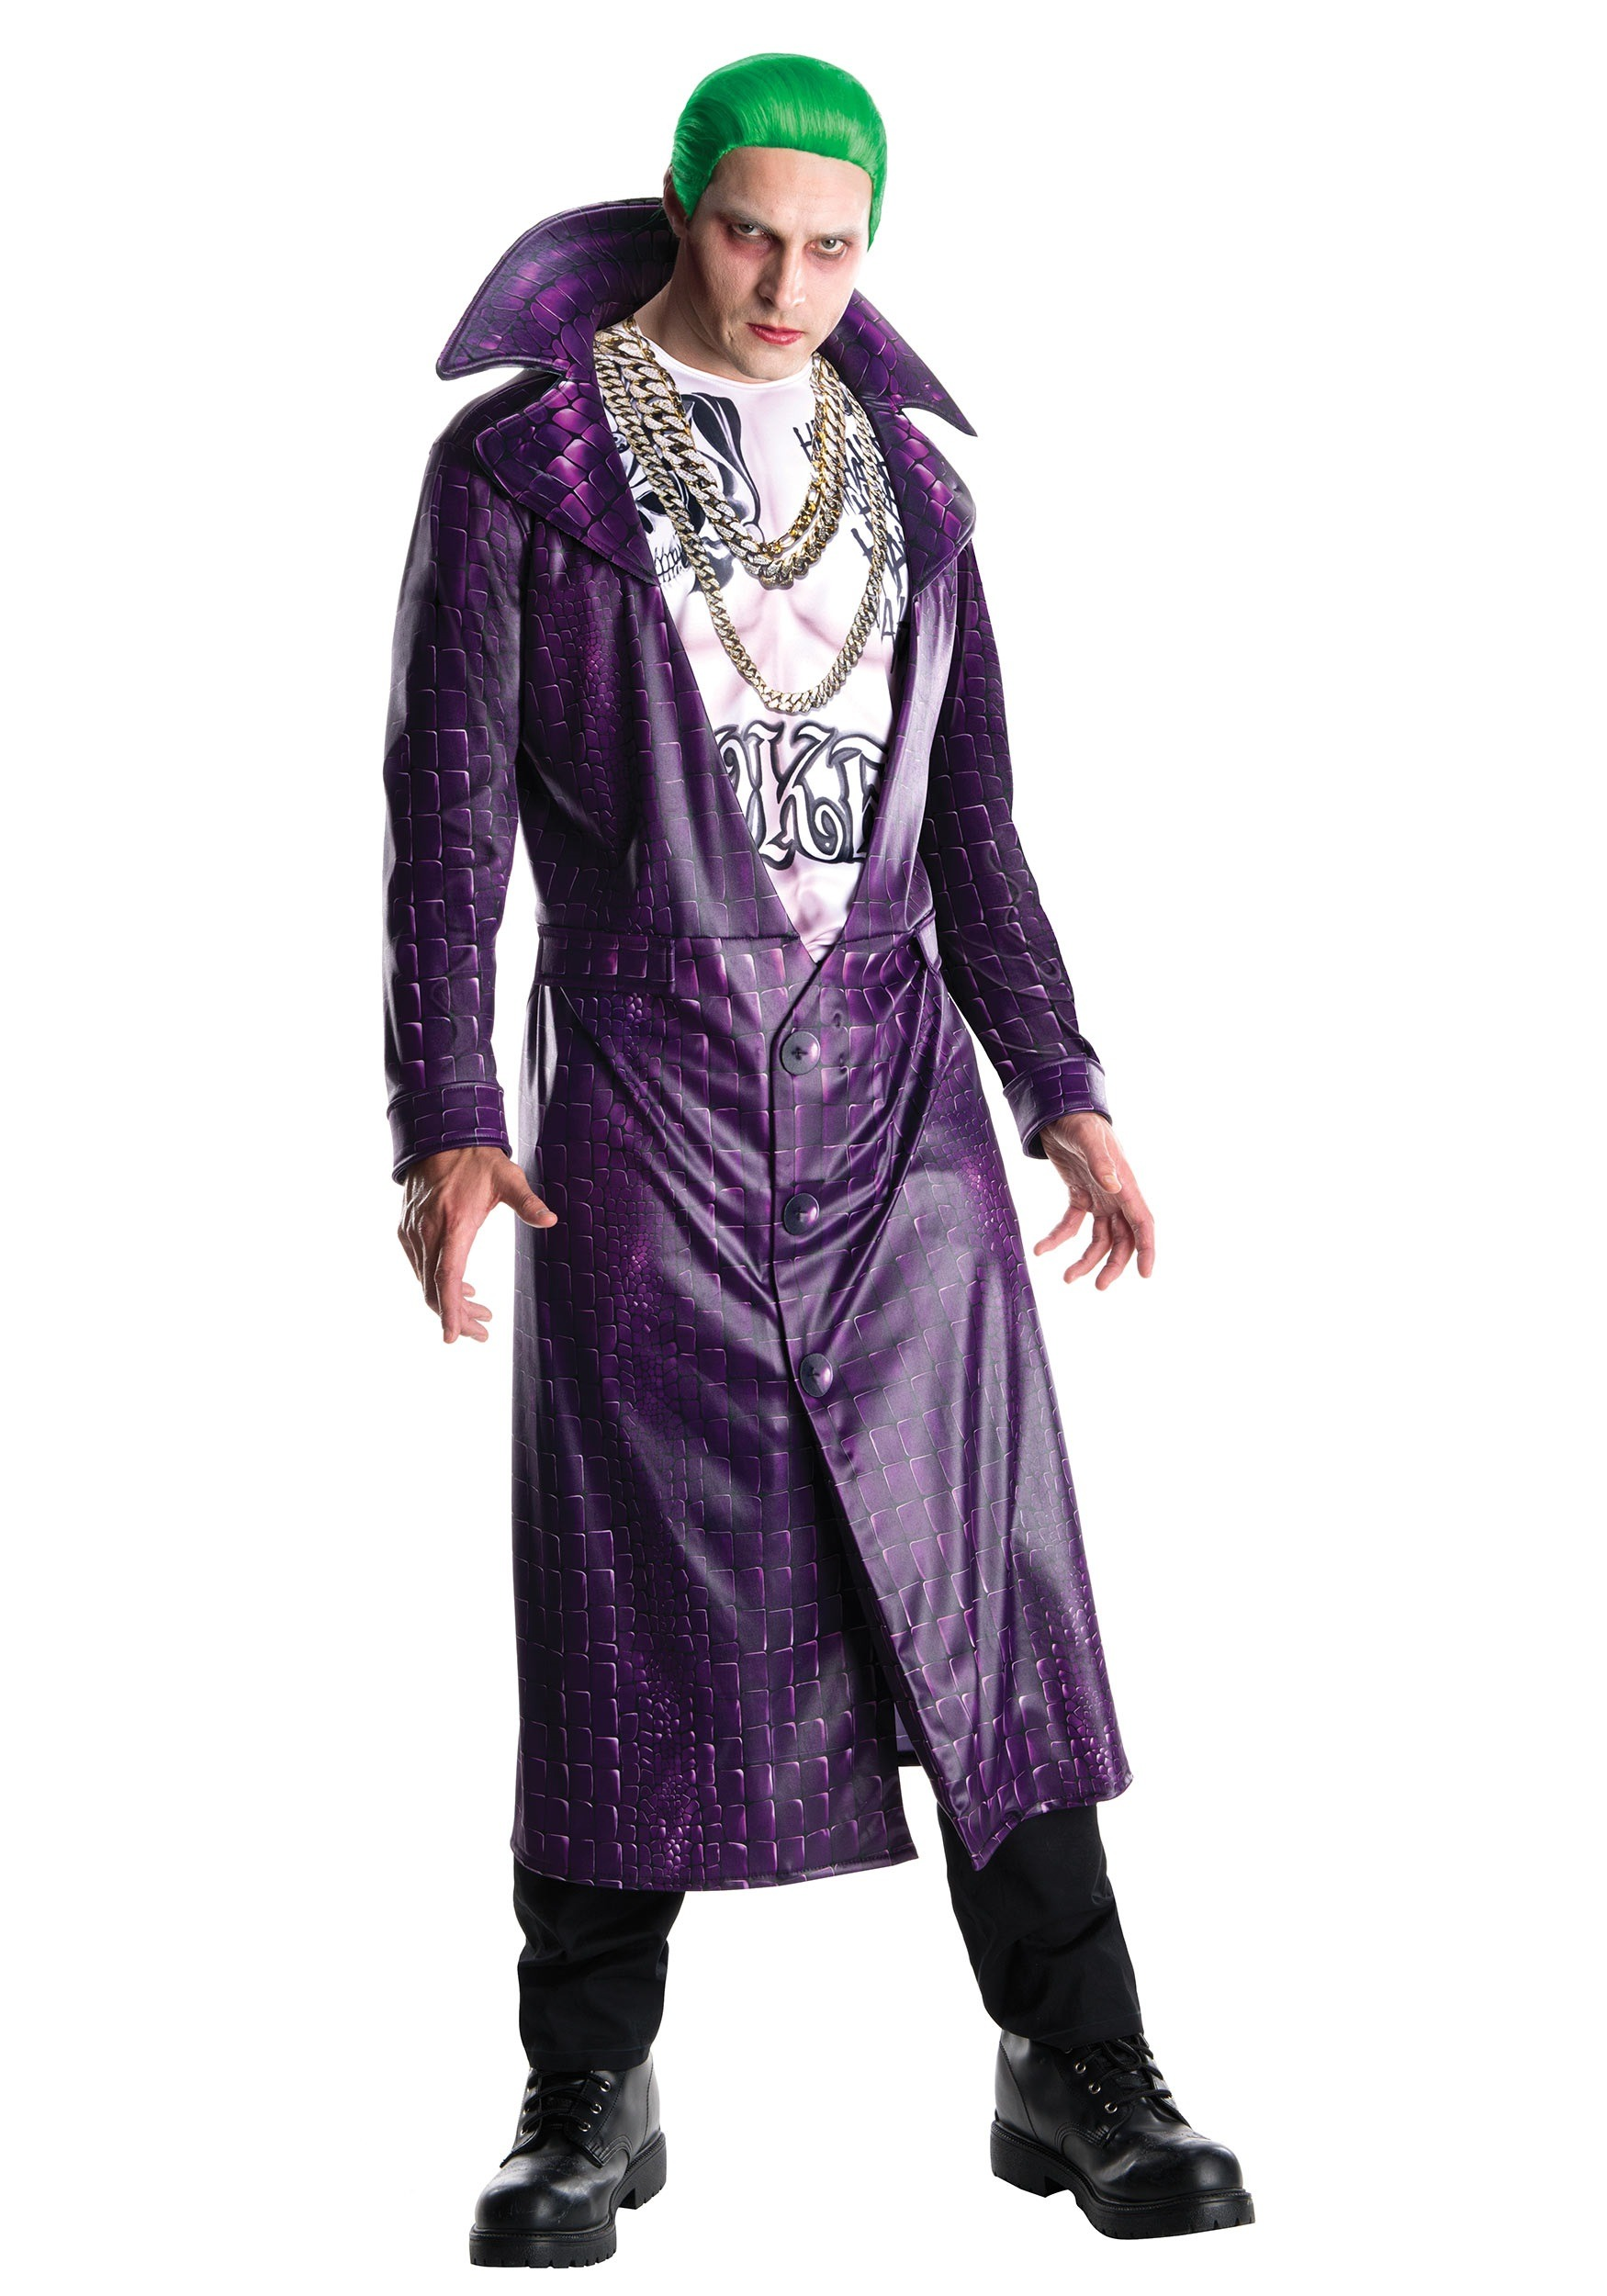 Deluxe Joker Suicide Squad Menu0027s Costume  sc 1 st  Fun.com & Deluxe Joker Suicide Squad Costume for Men